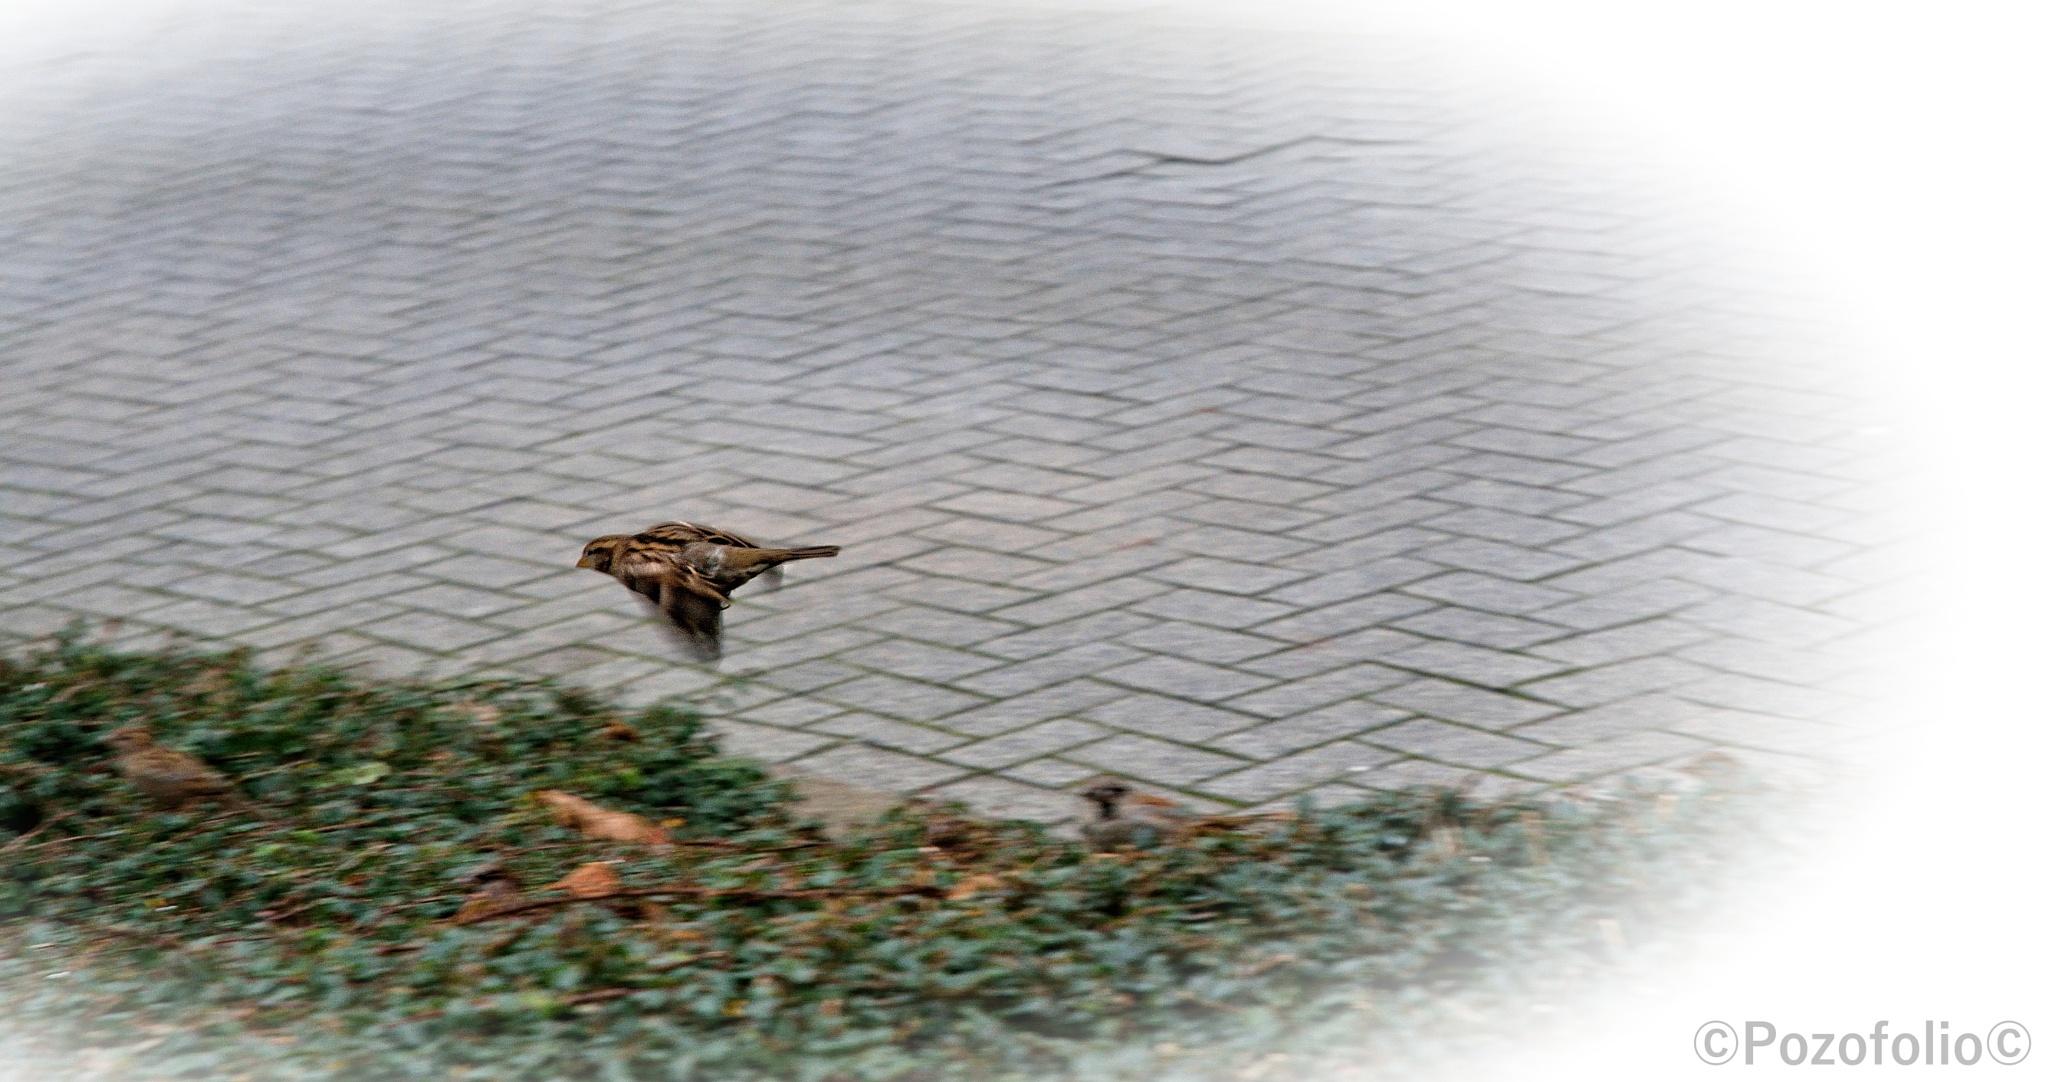 The messenger bird  by Pozofolio